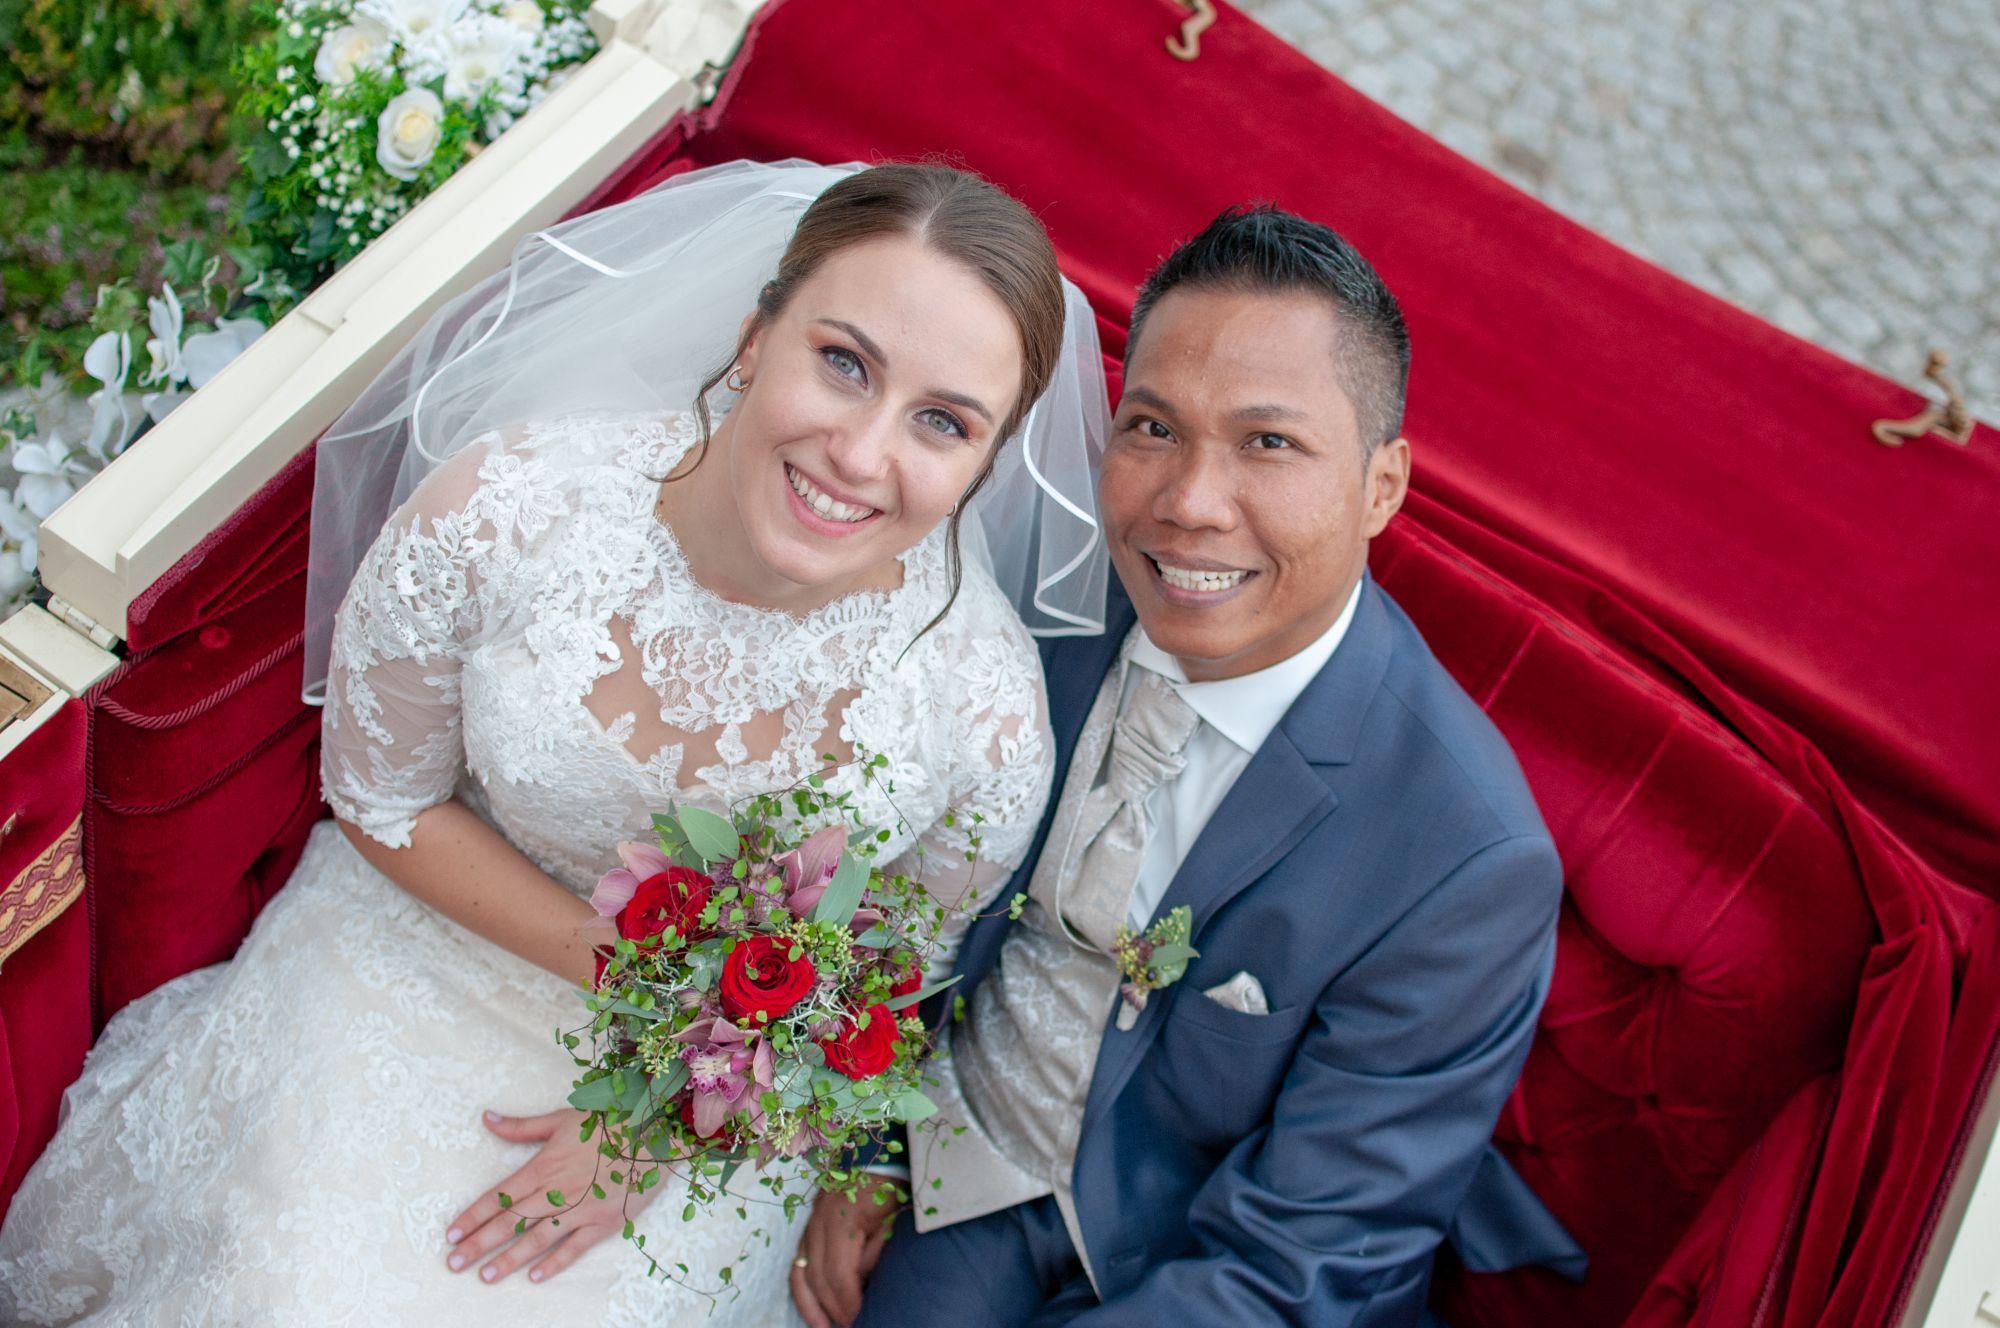 Brautpaar in Kutsche